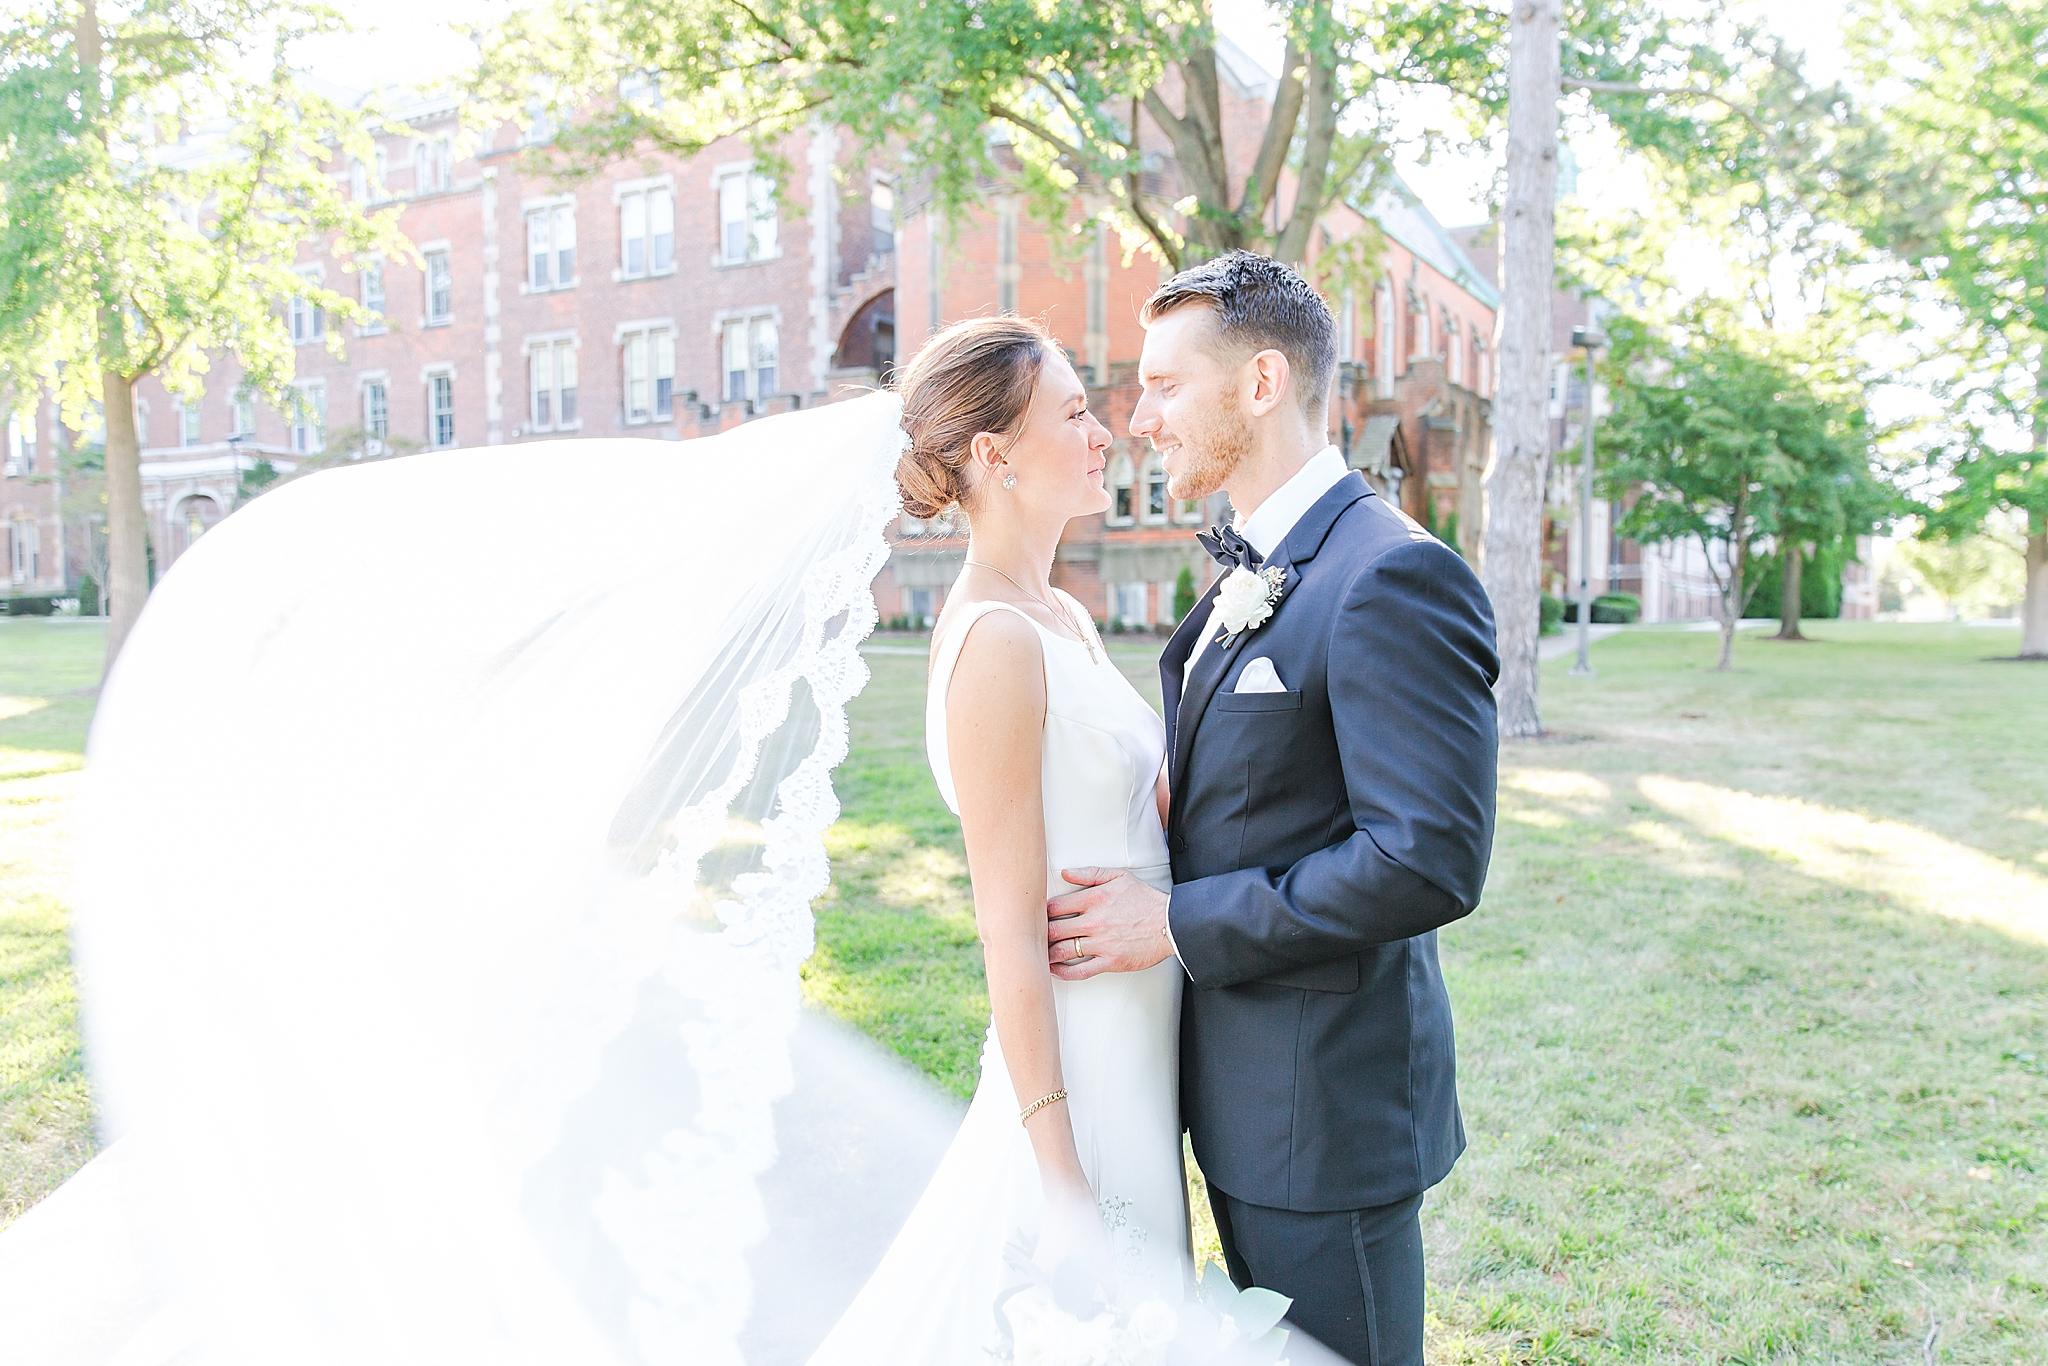 detroit-wedding-photographer-grosse-pointe-academy-chapel-detroit-golf-club-wedding-carly-matt-by-courtney-carolyn-photography_0075.jpg